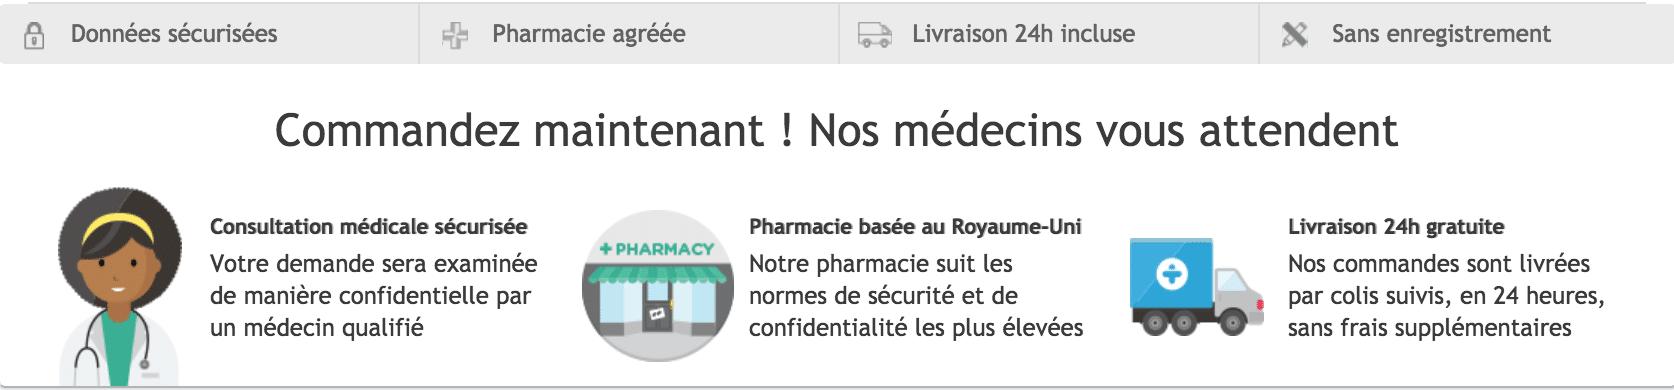 acheter du viagra sur une pharmacie agree